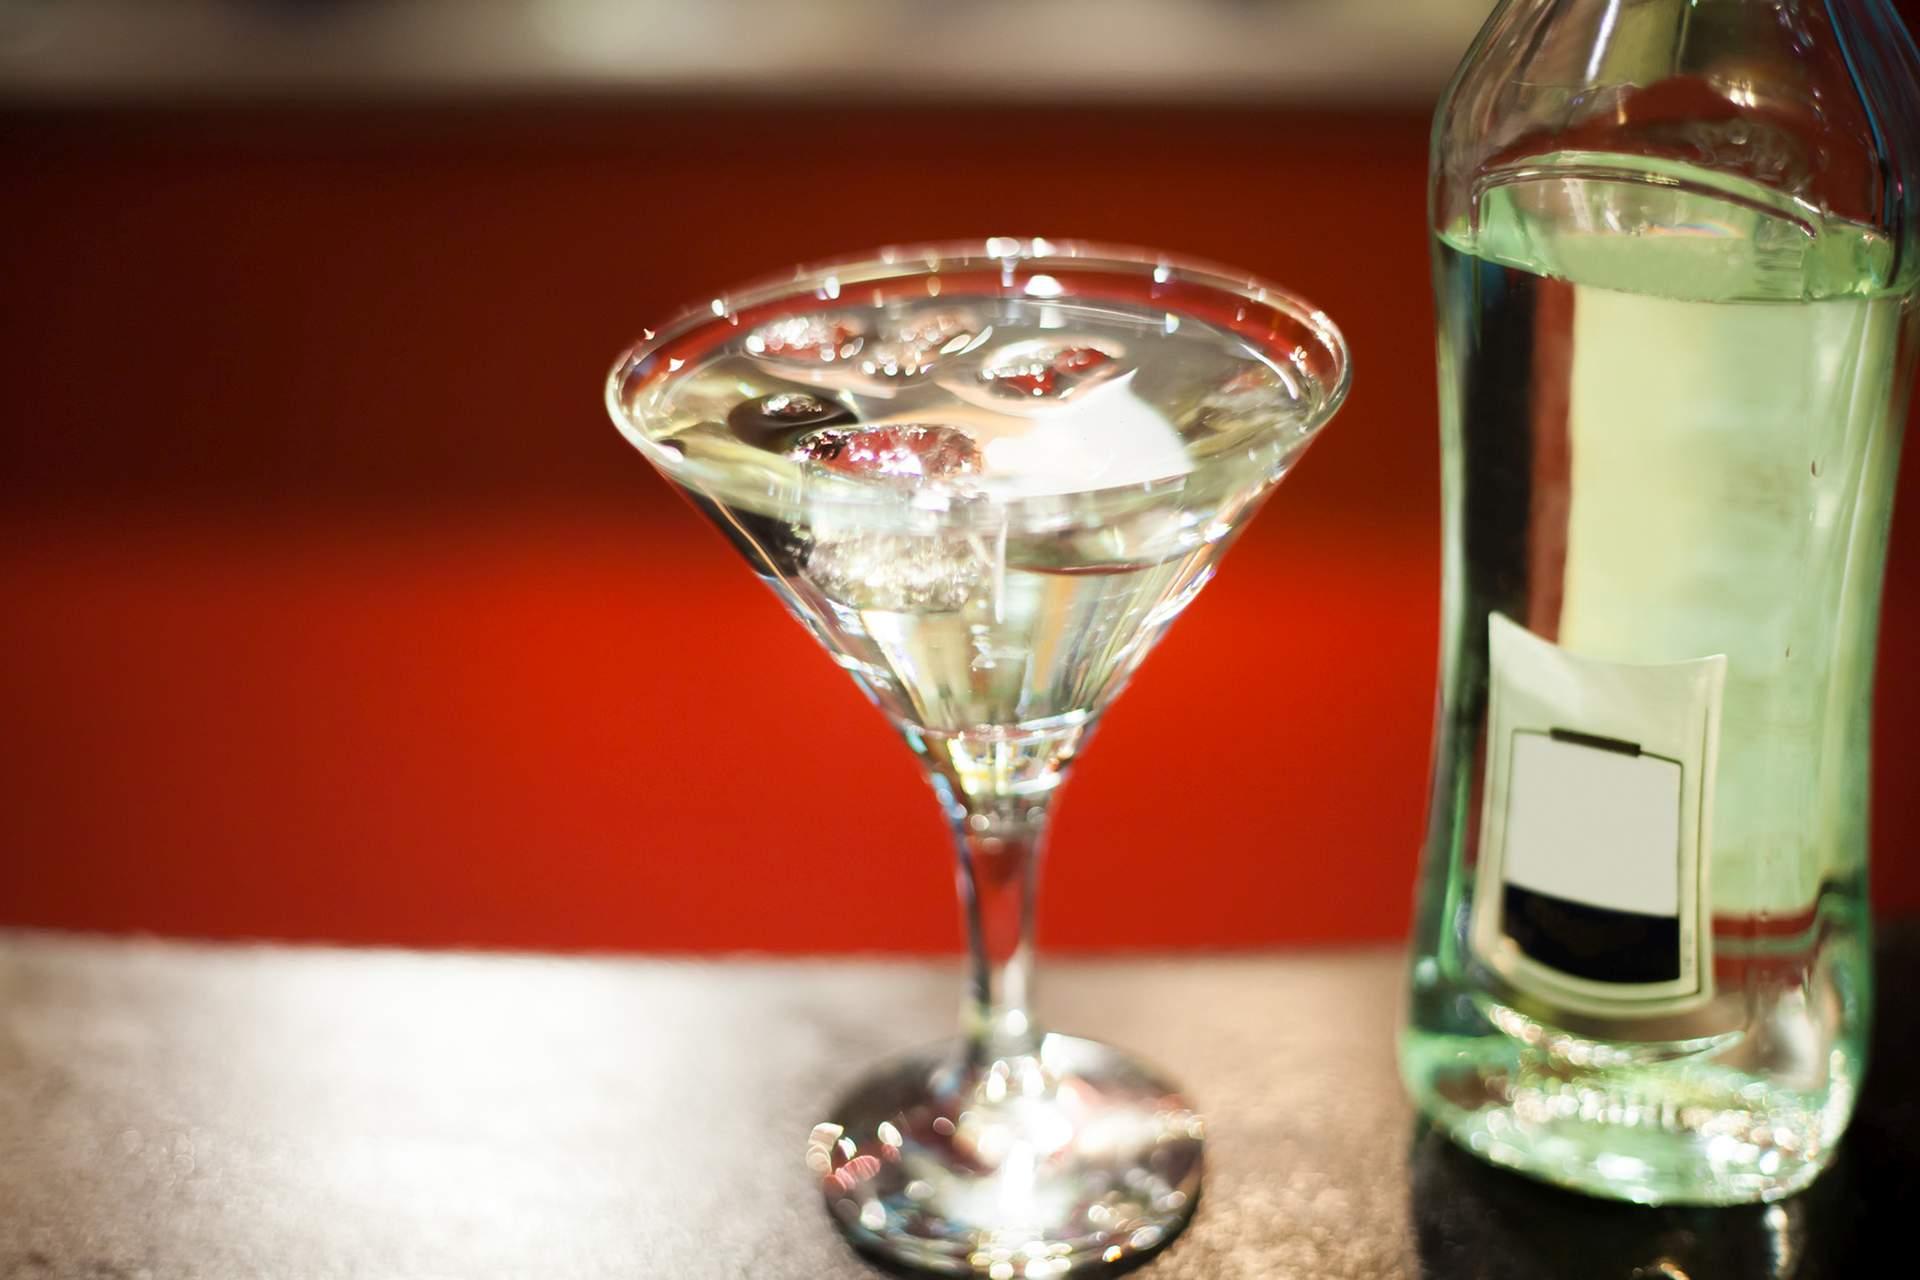 Ein Glas Martini mit Wermut. Quelle: Fotolia.com © fizkes